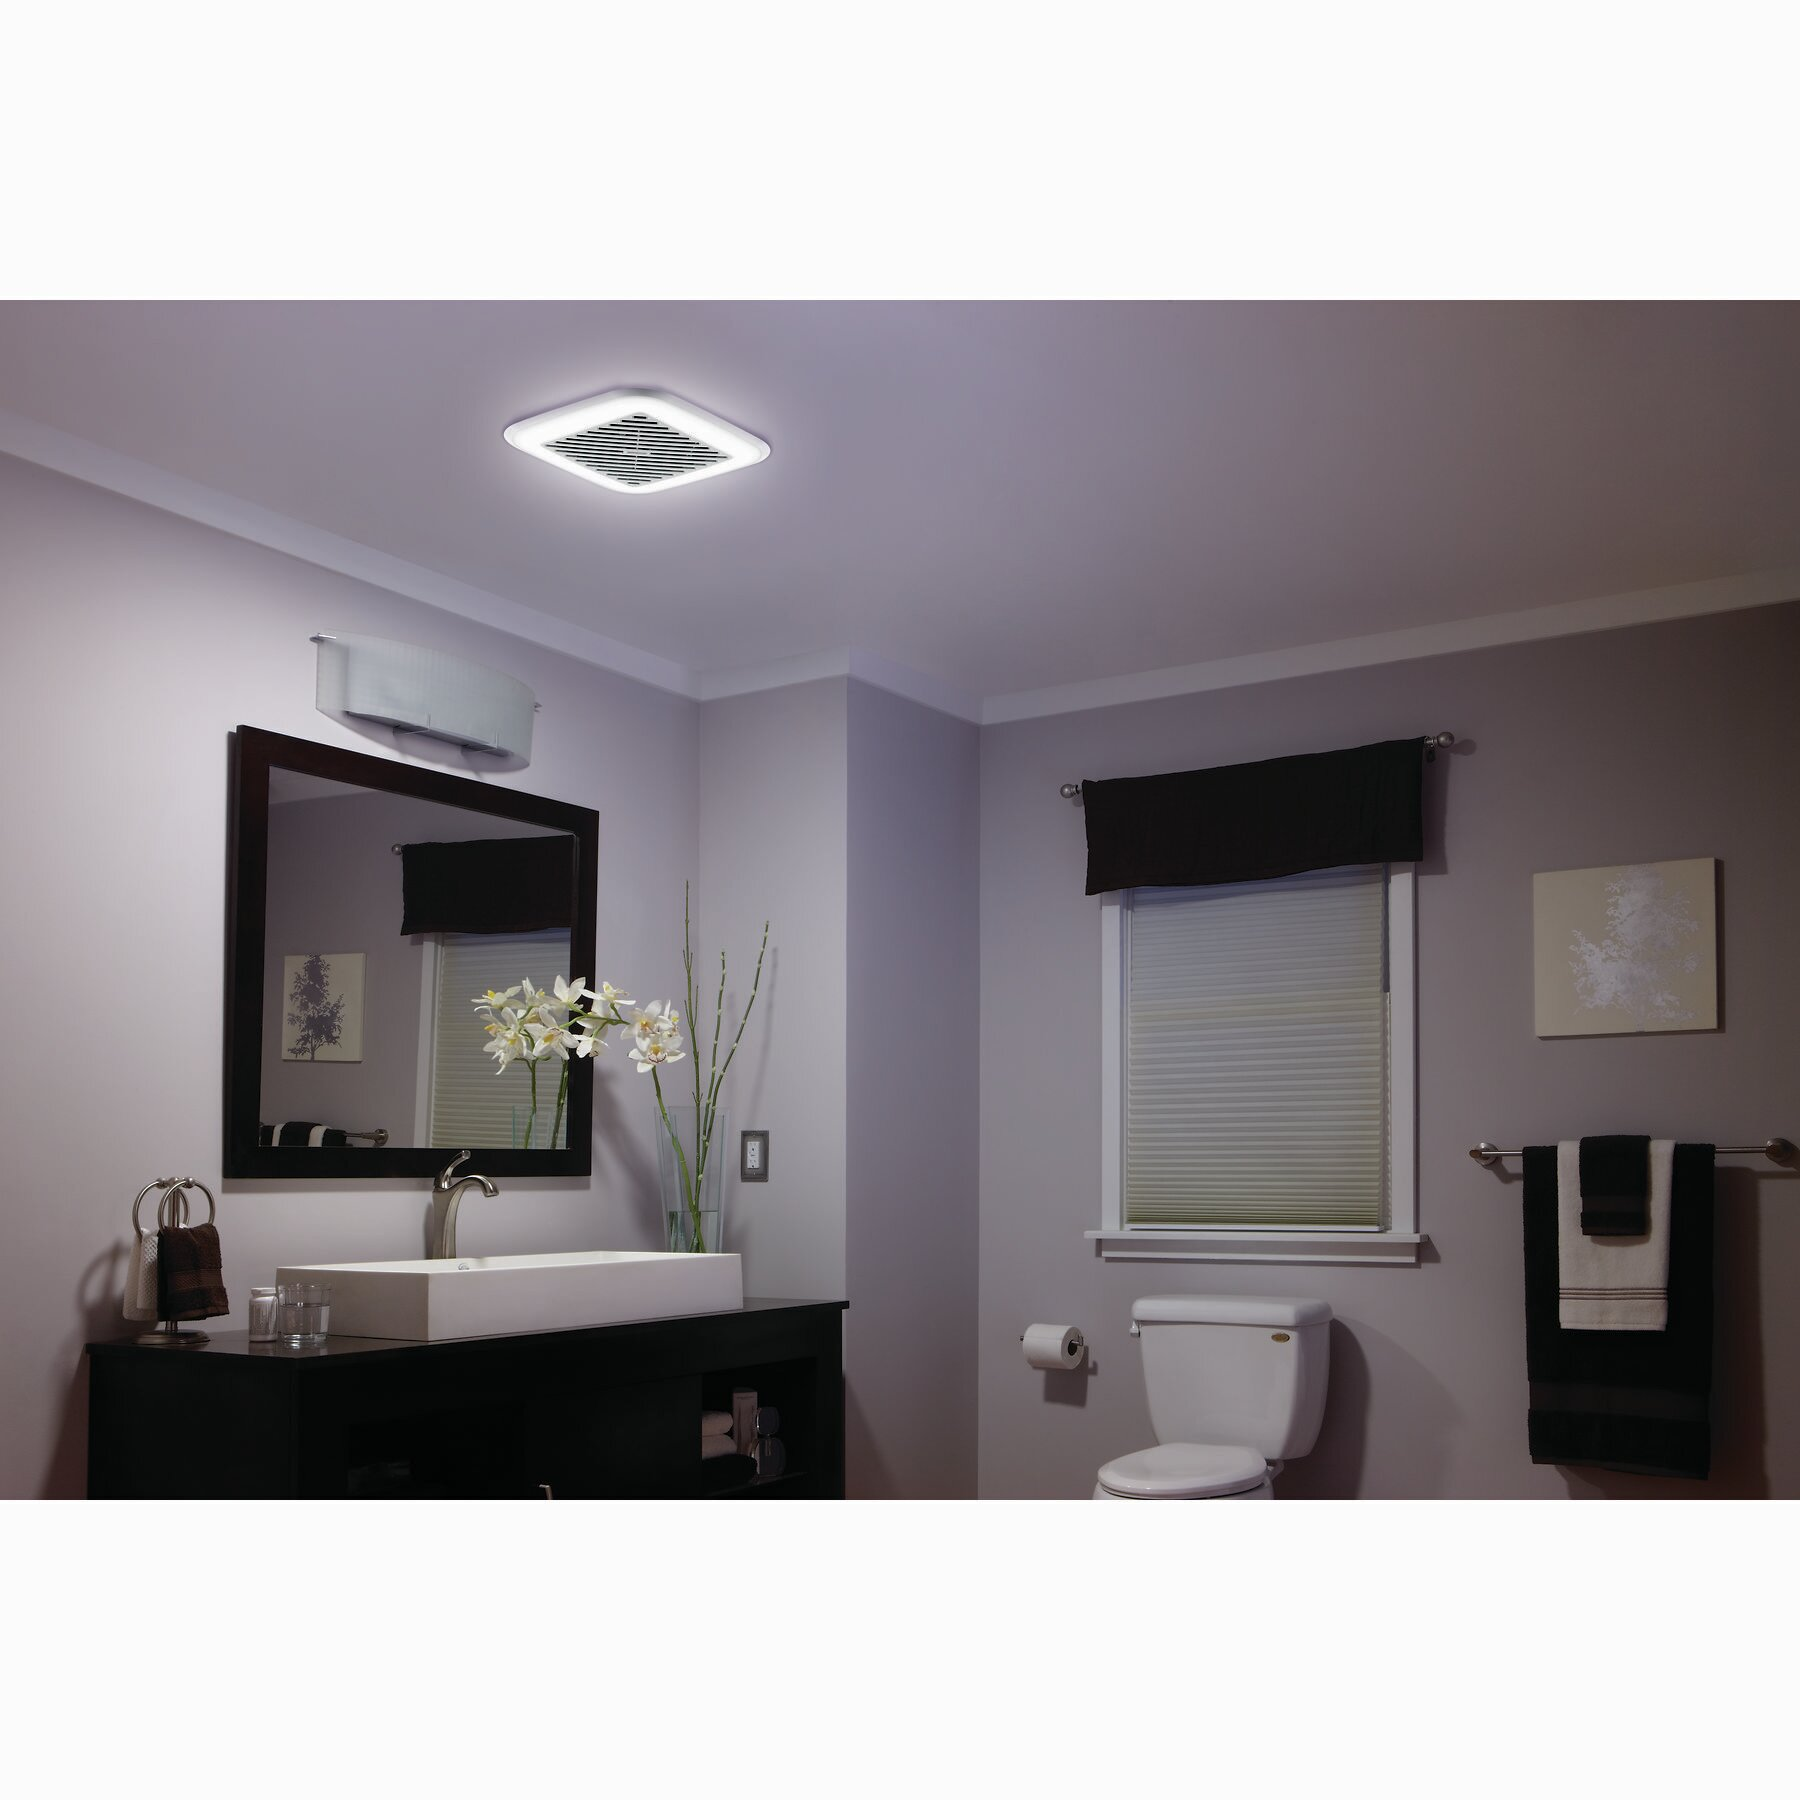 Broan 100 CFM Energy Star Bathroom Fan with Light  Broan 100 CFM Energy  Star Bathroom. Broan Ductless Bathroom Fan With Light